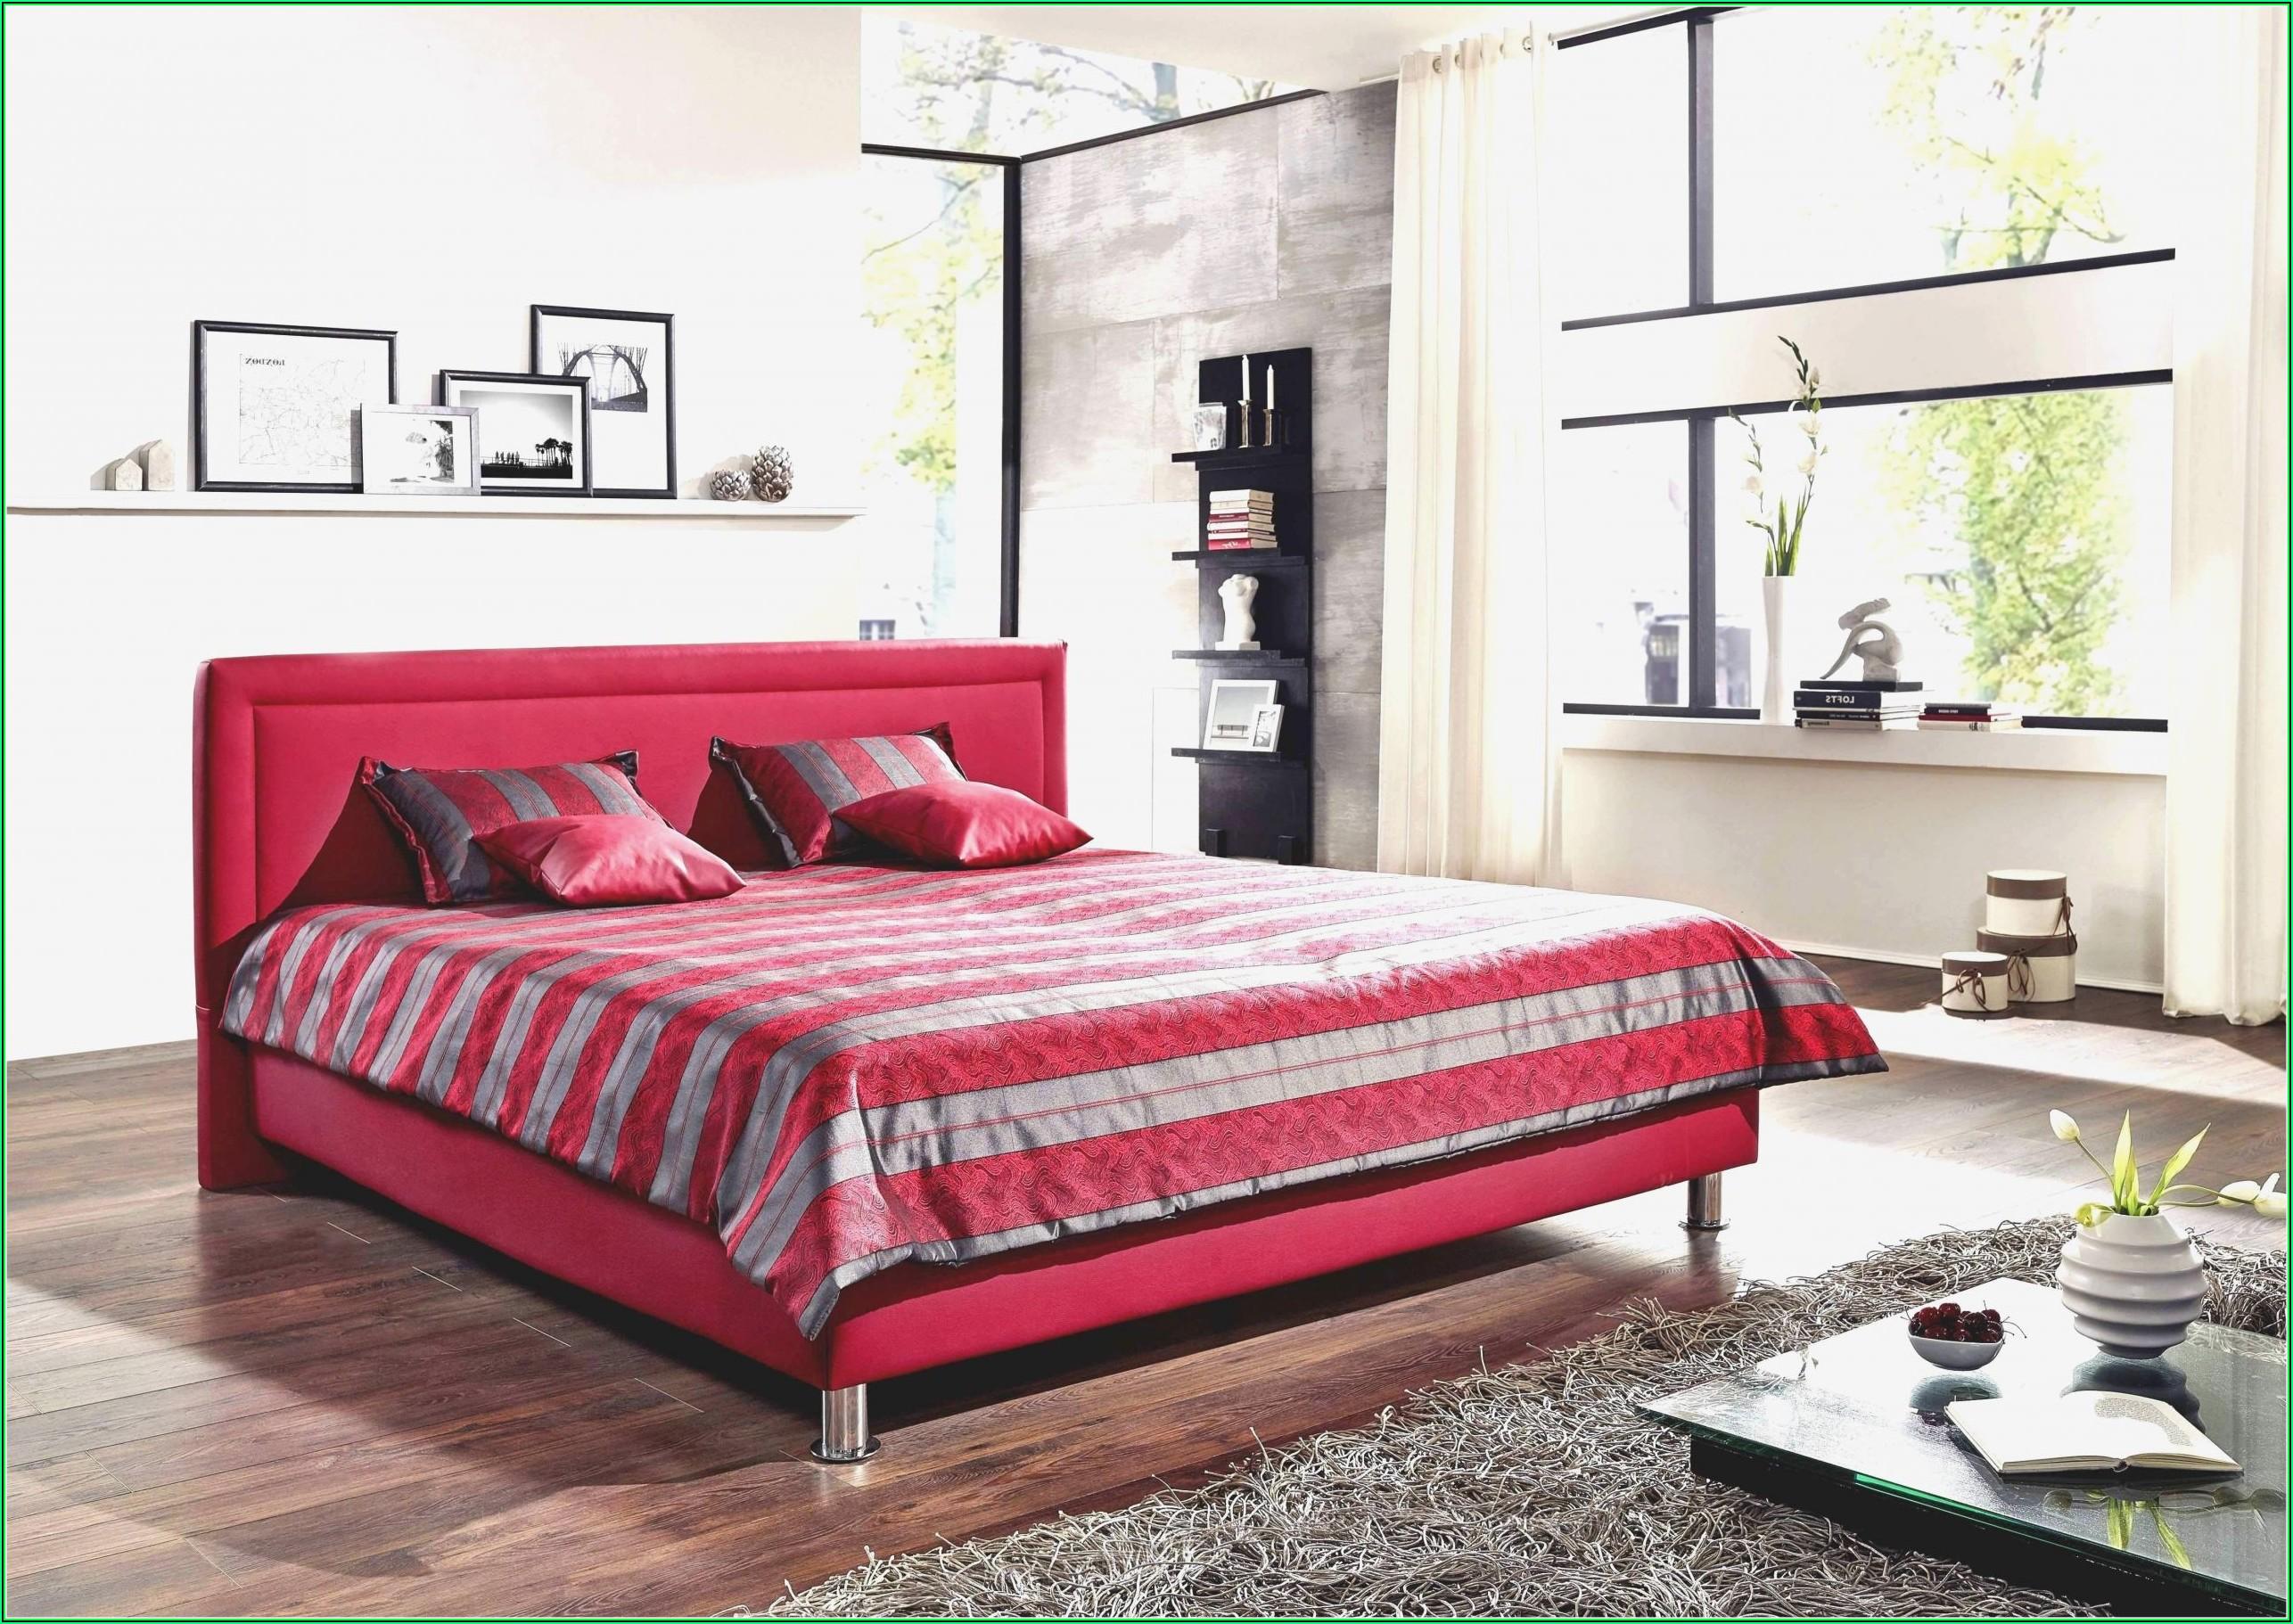 Jugend Schlafzimmer Ikea